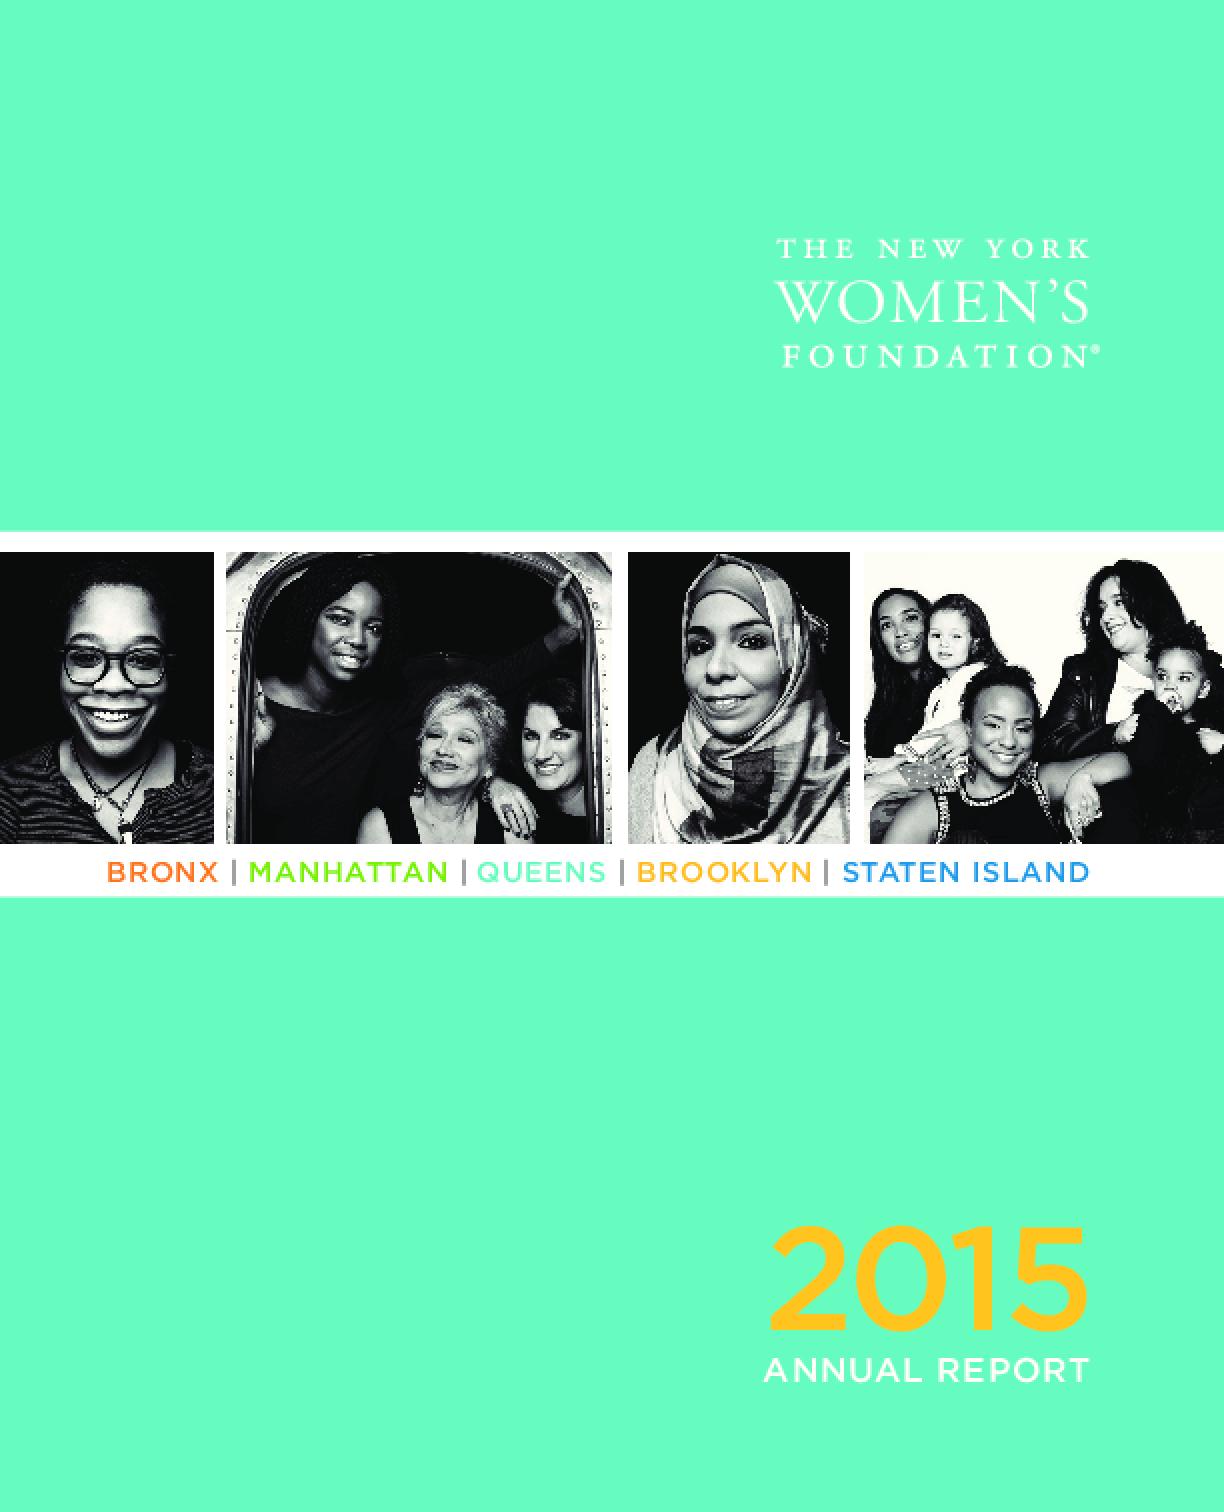 New York Women's Foundation, 2015 Annual Report